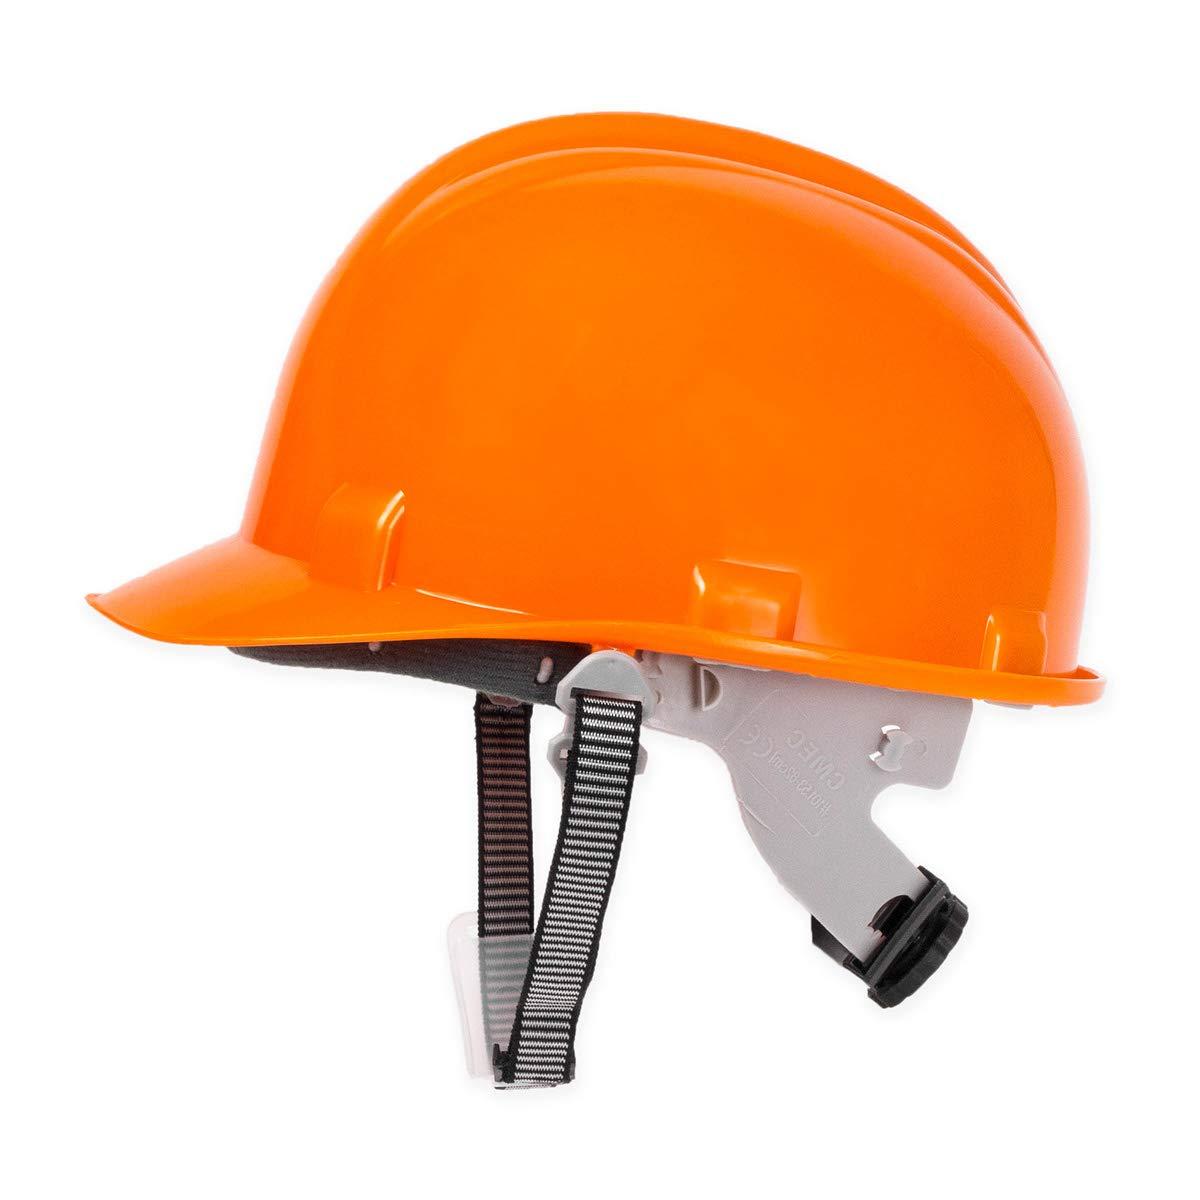 Bauhelm Schutzhelme Helm Arbeitsschutzhelm Orange EN397 Lotex GmbH